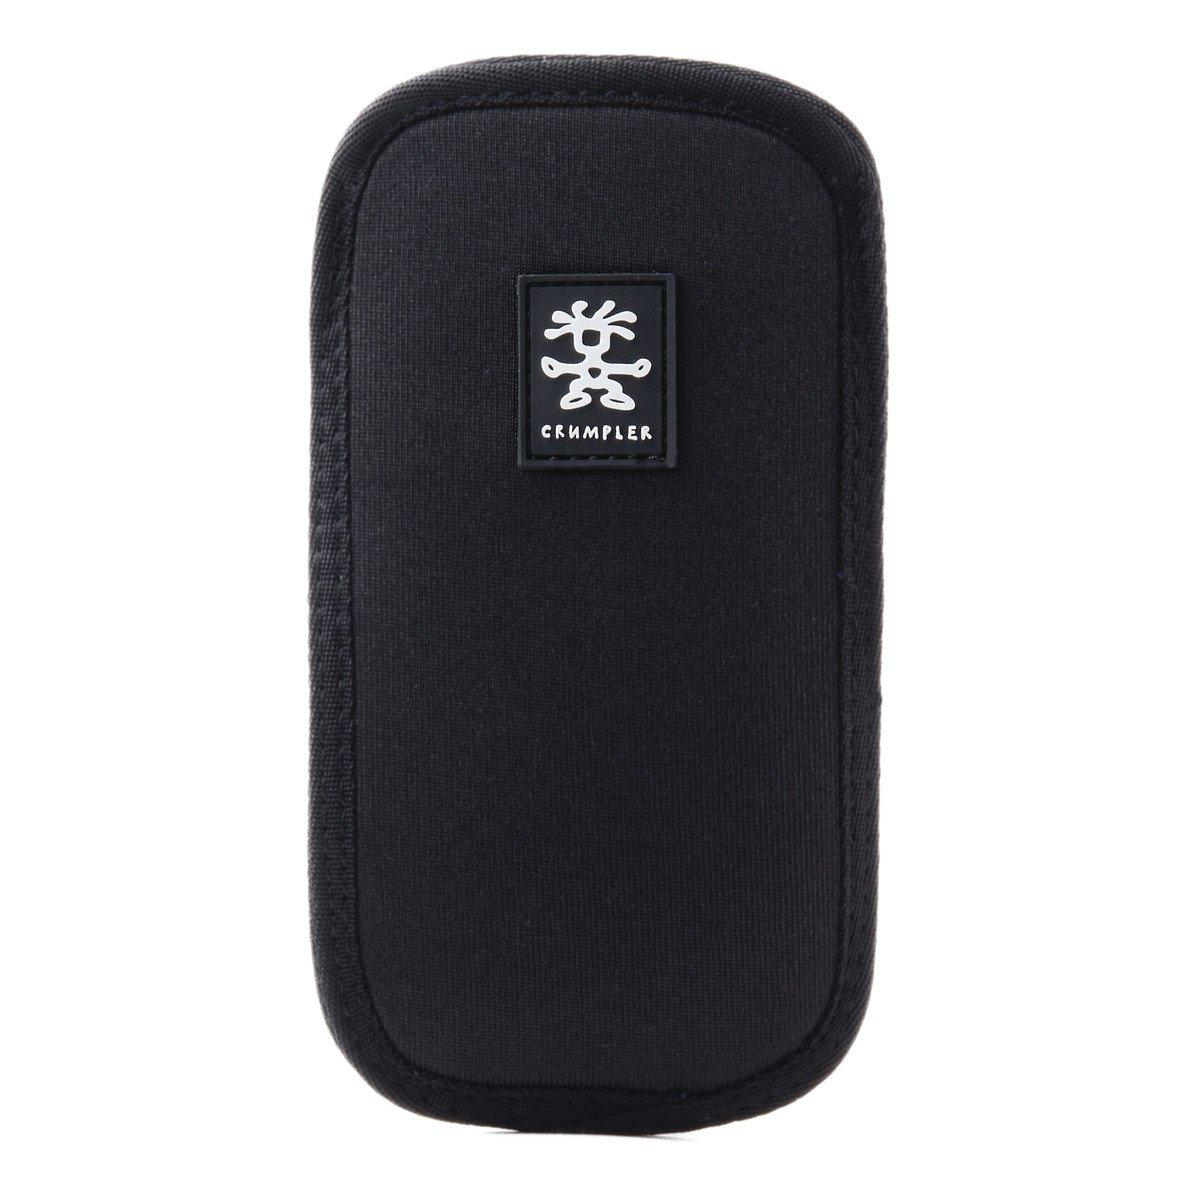 CRUMPLER Base Layer Smart Phone 80